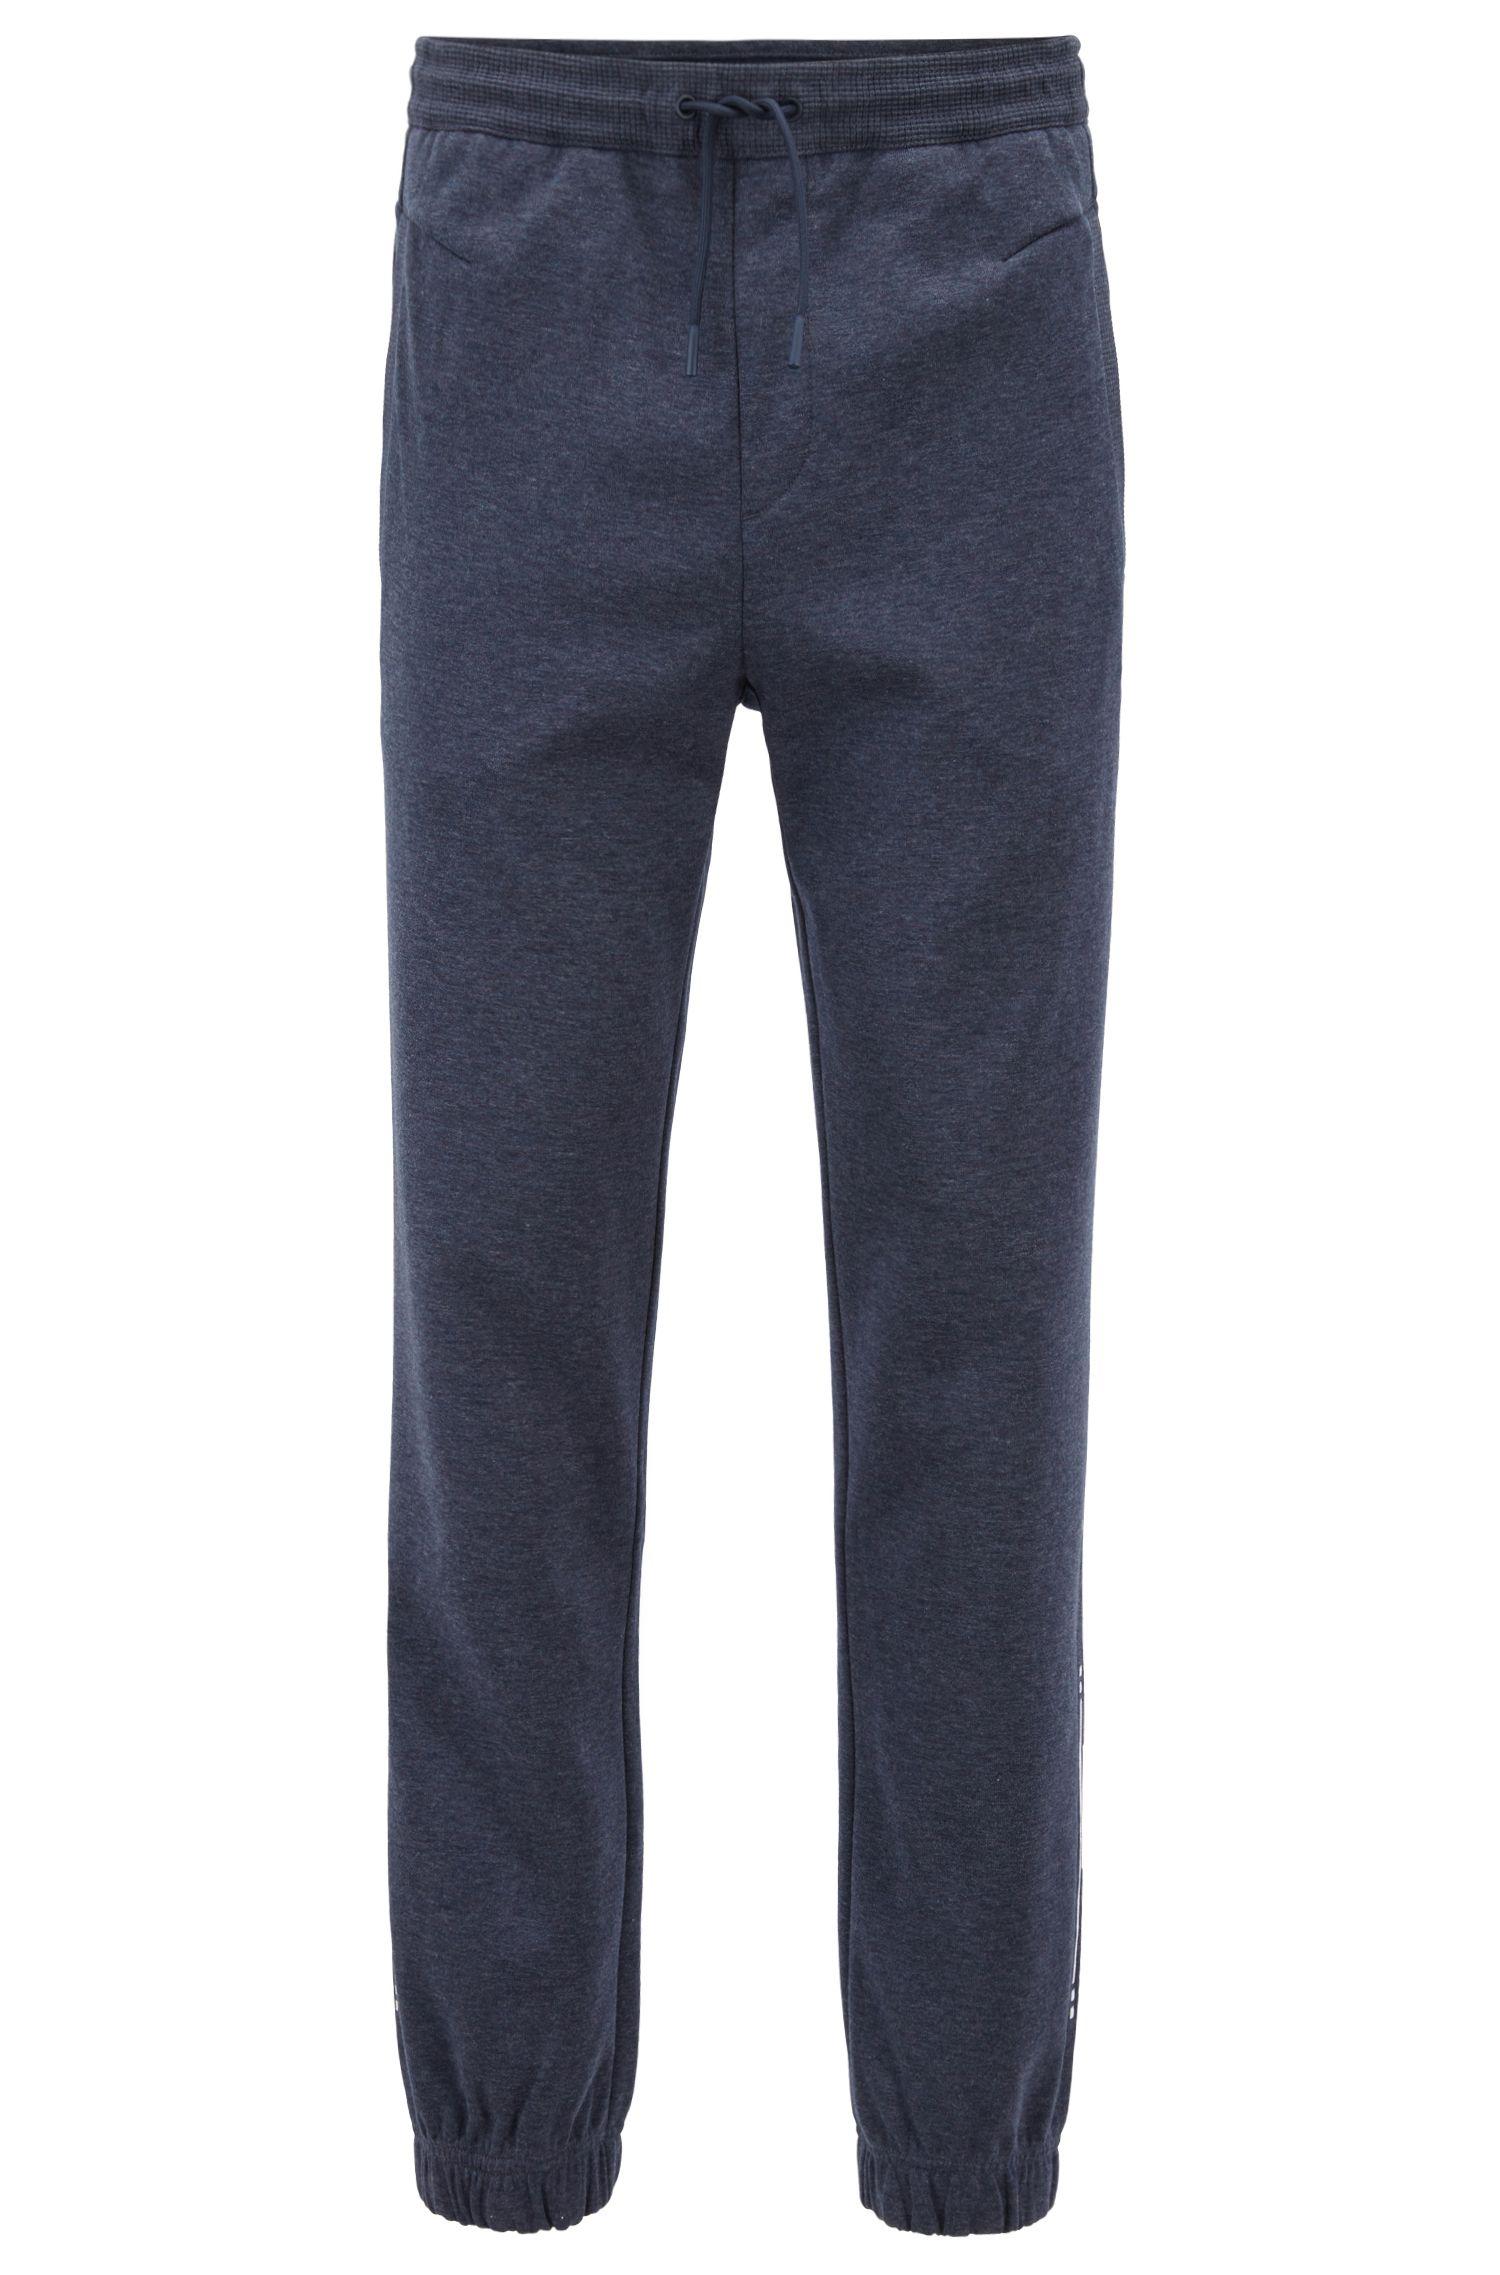 Slim-fit joggingbroek met boorden en geborduurde streep, Donkerblauw